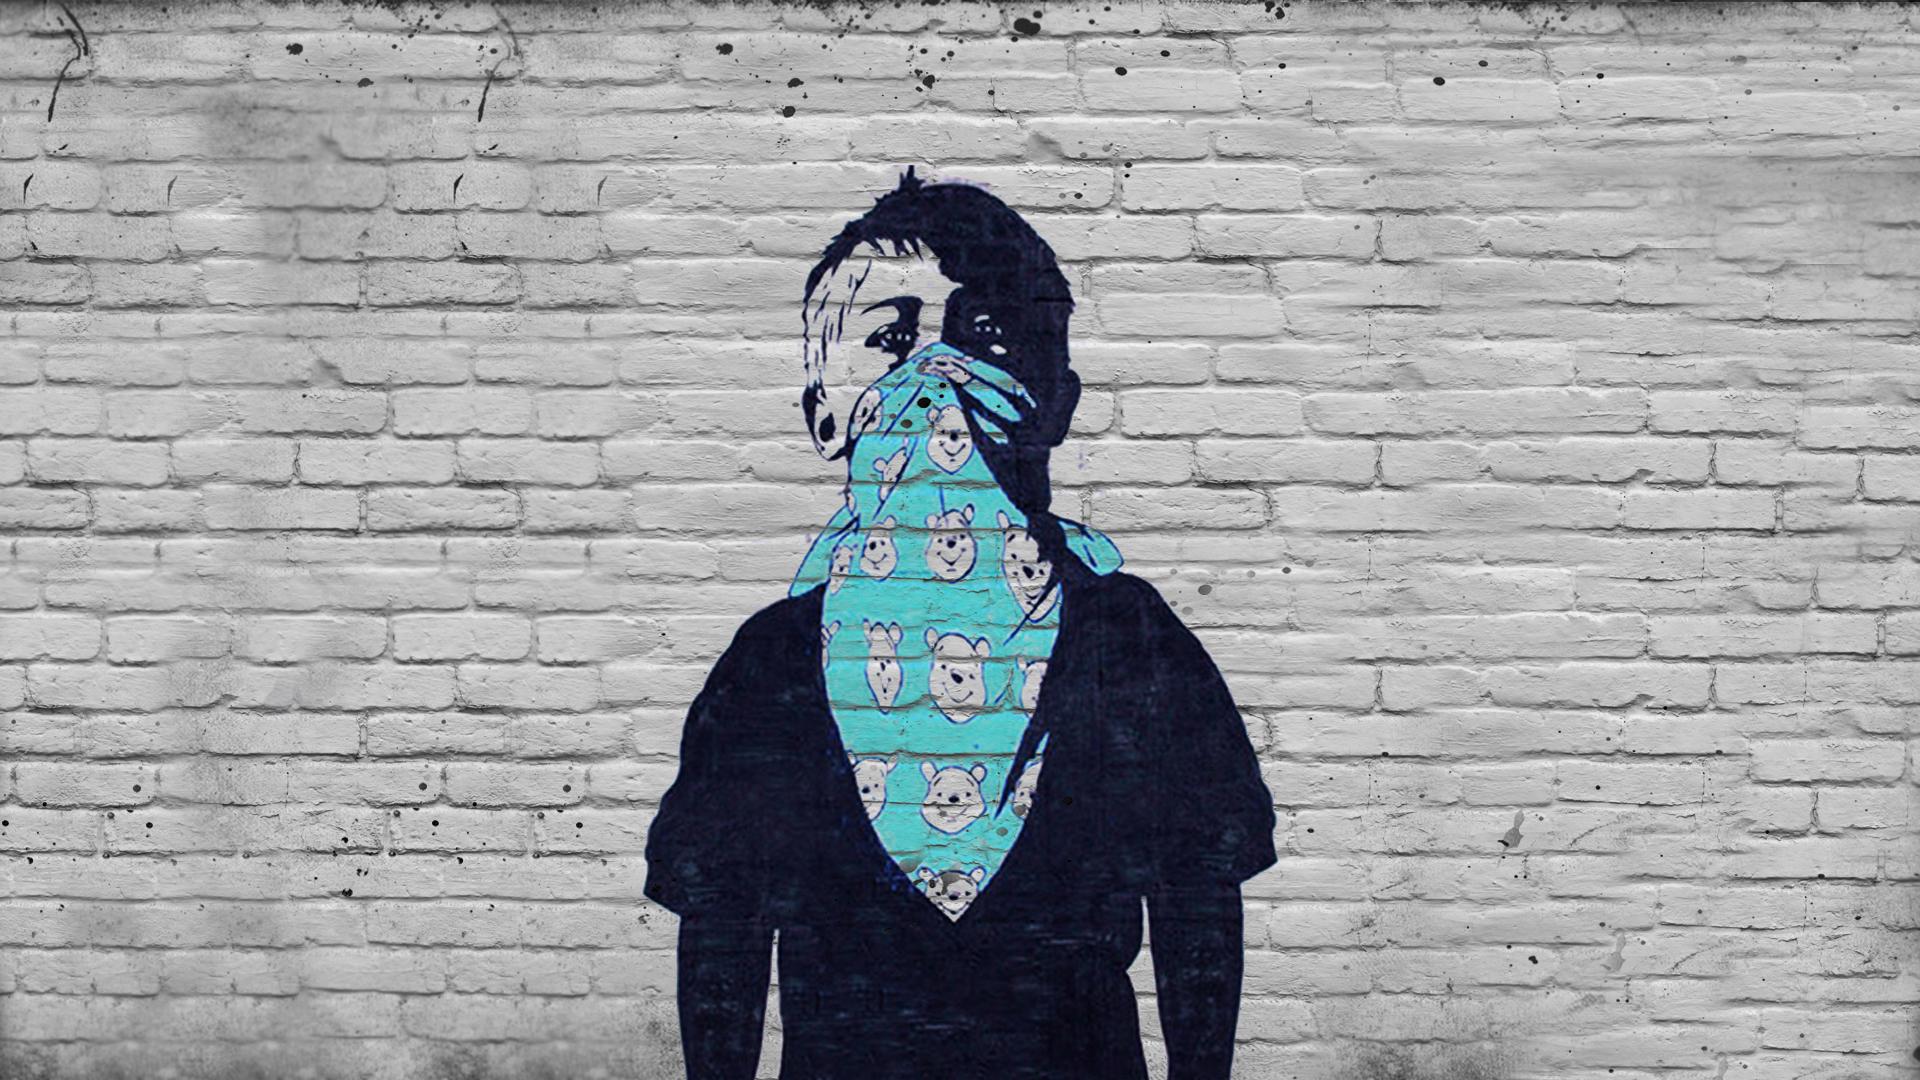 Graffiti Art Wallpapers Group 71